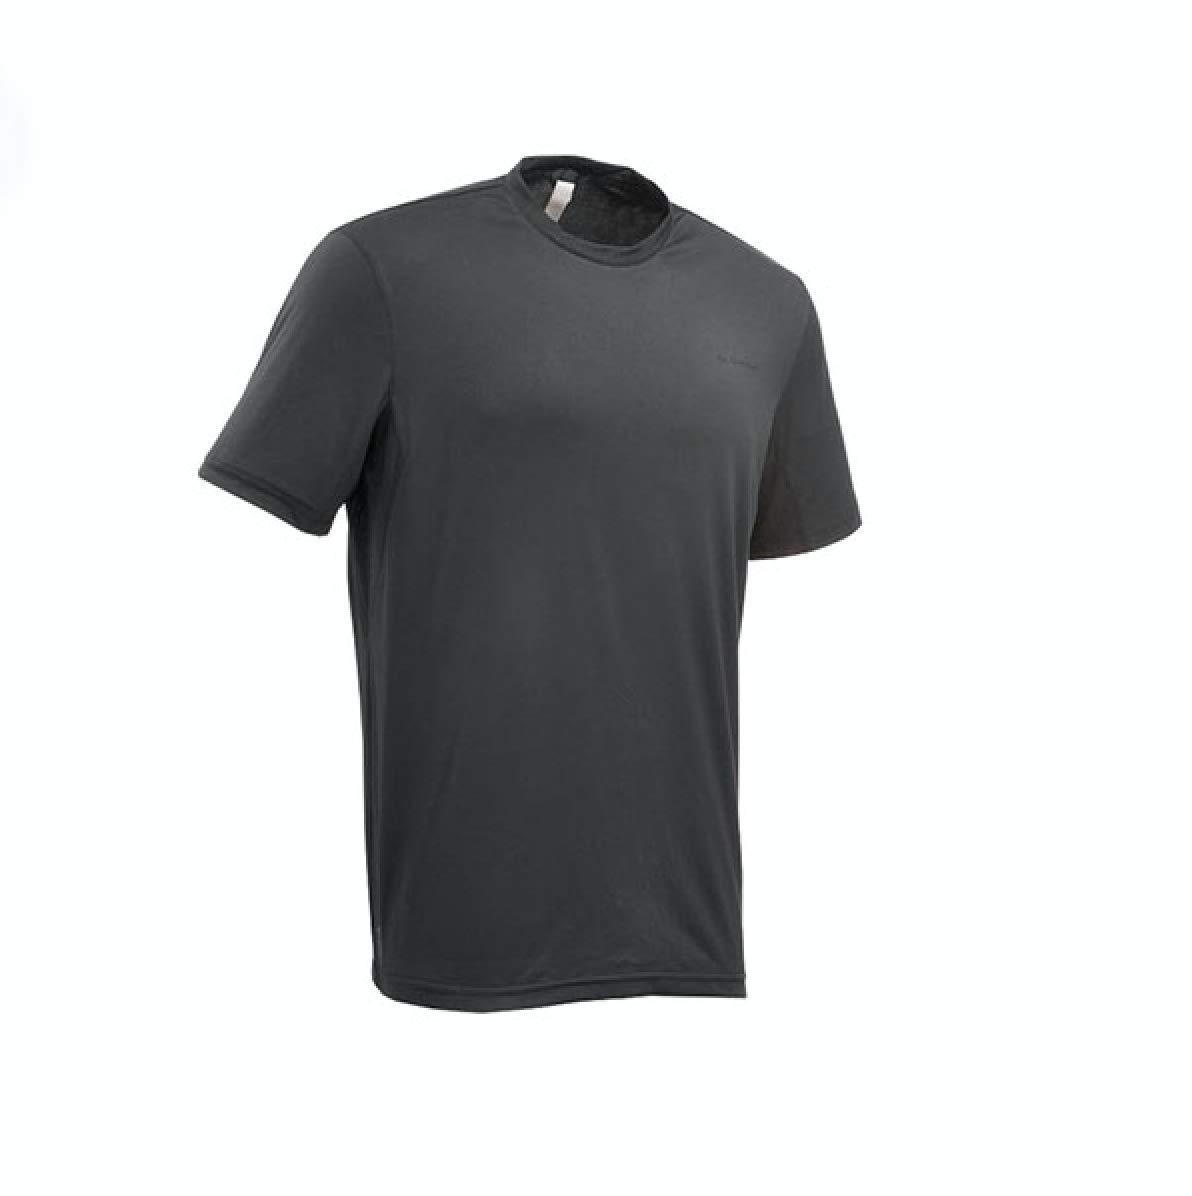 Black, Grey, blueee XL Men's Sportswear Running Fitness Sports Screw Neck Quick Dry Short Sleeve TShirts 3 Pieces